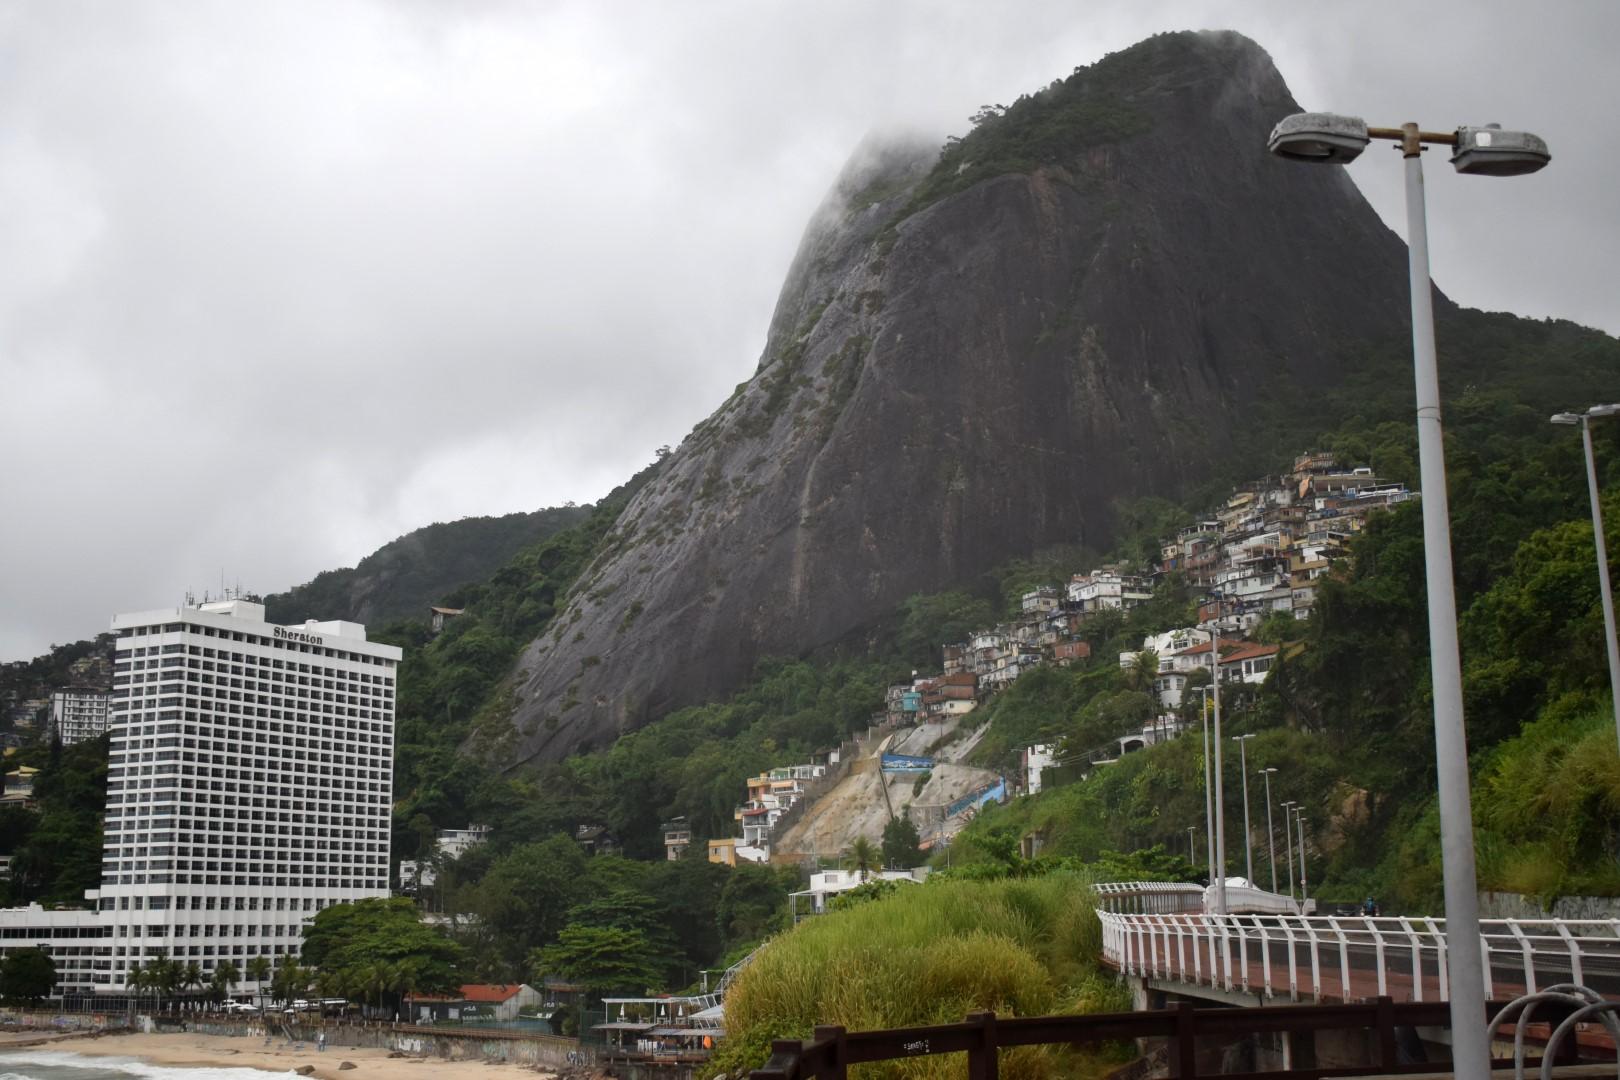 Favela Vidigal from Mirante do Leblon, Rio de Janeiro